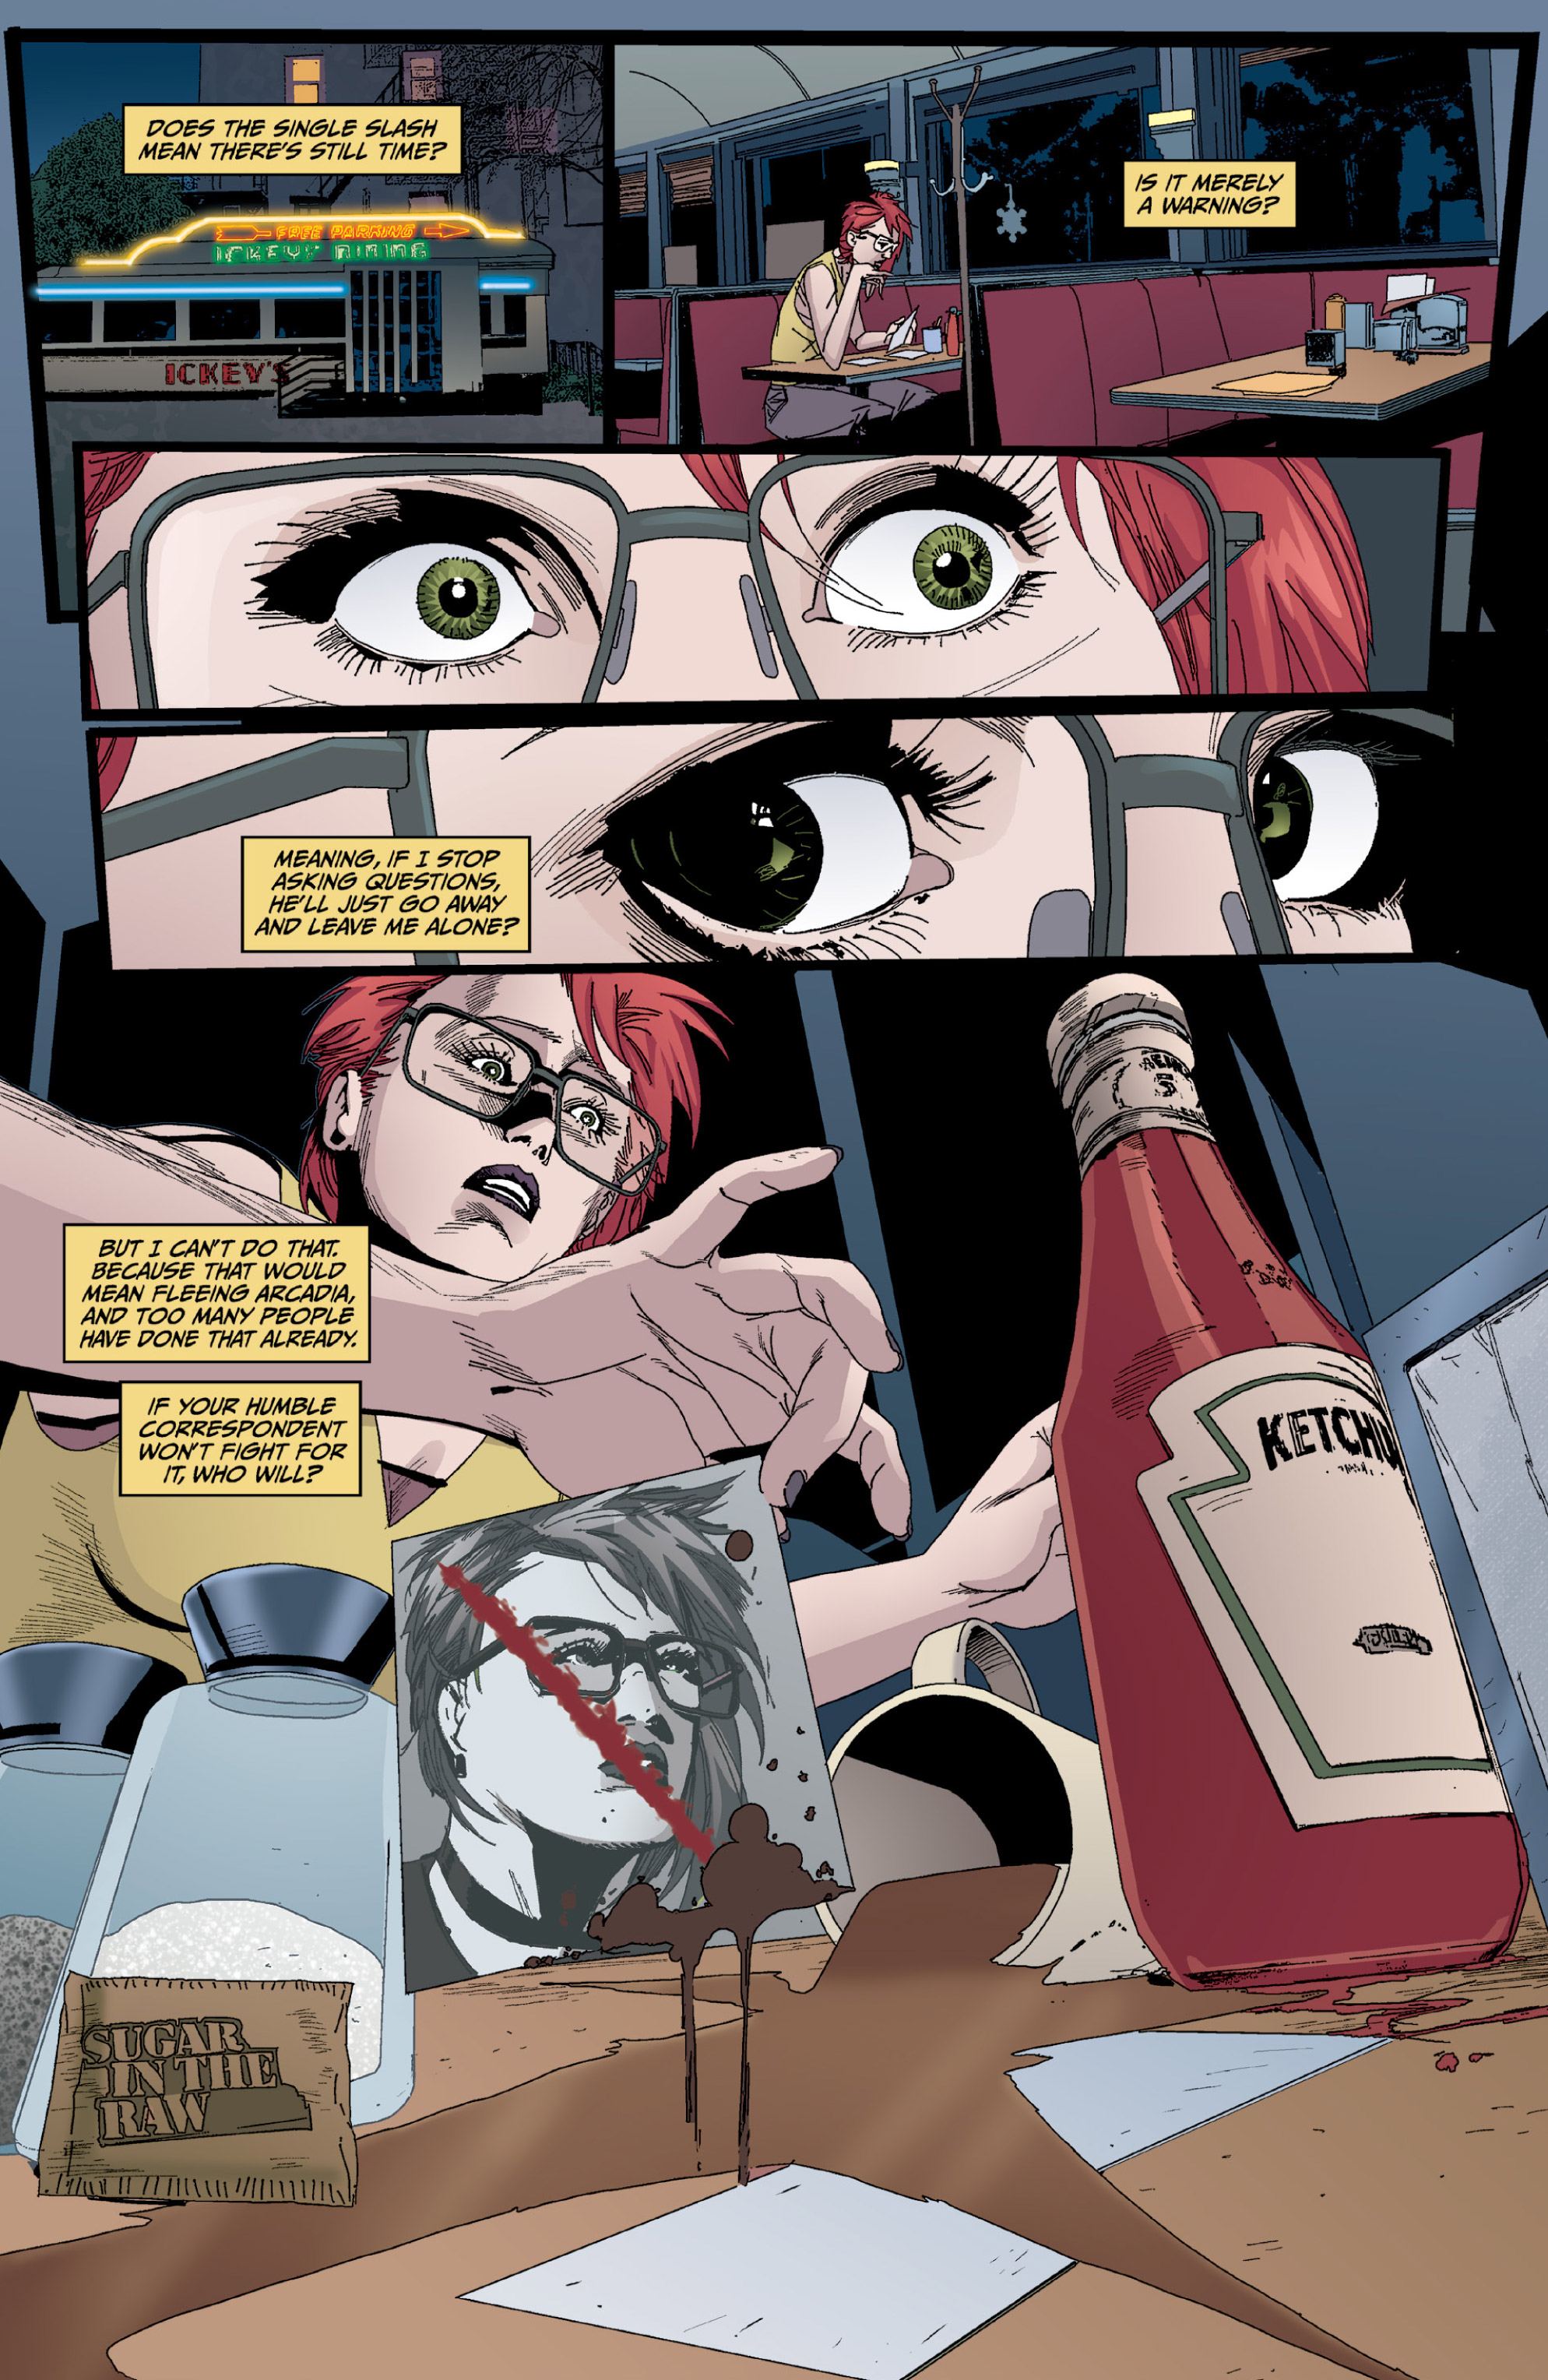 Read online X: Big Bad comic -  Issue # Full - 81